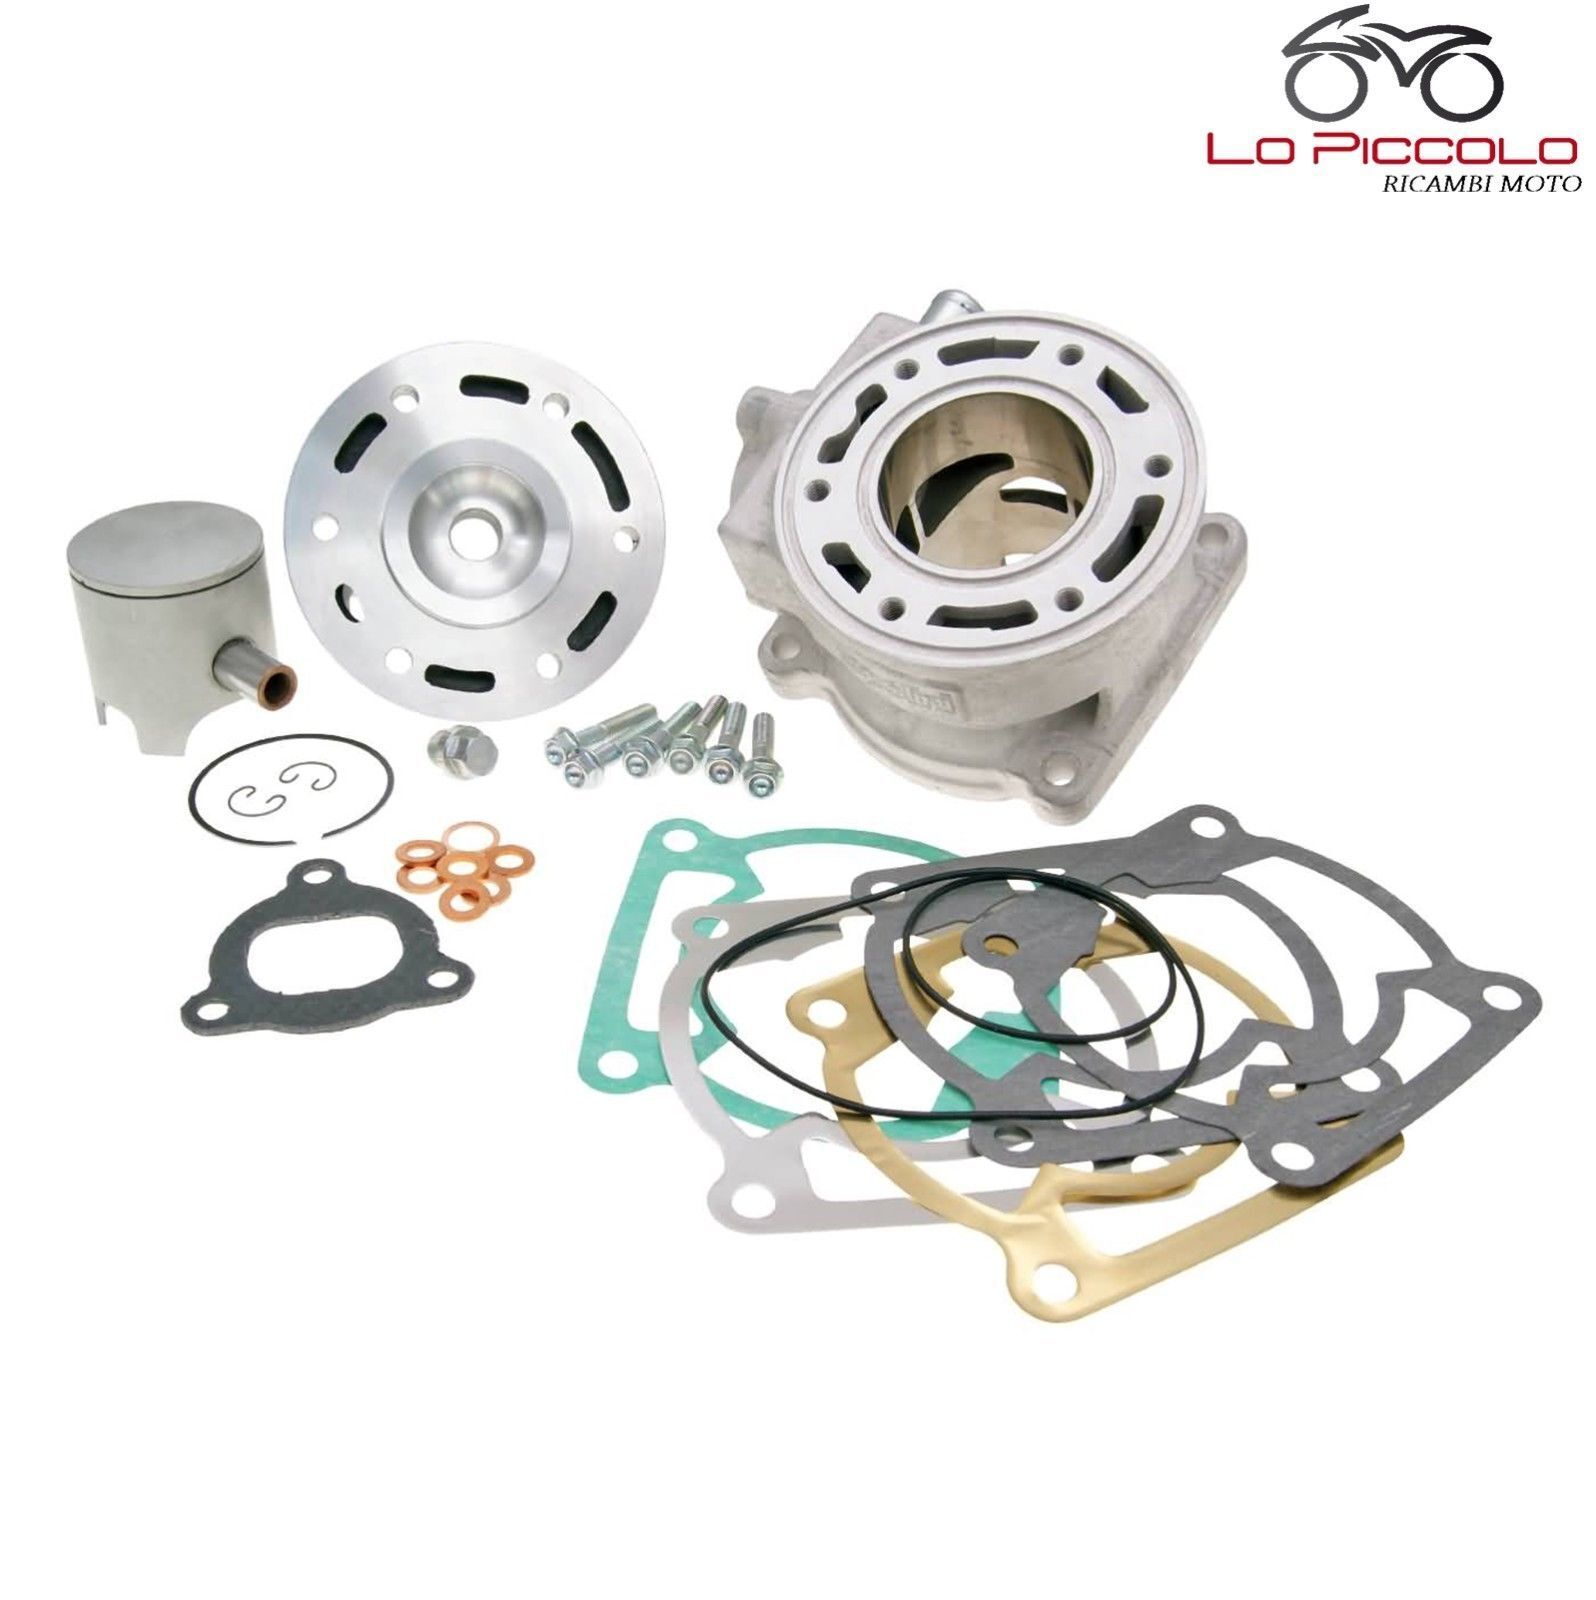 6 Satz Kolbenringe Mahle ABV VR6 2,9L Komplettsatz 6 Zylinder Turbofest 82,01mm